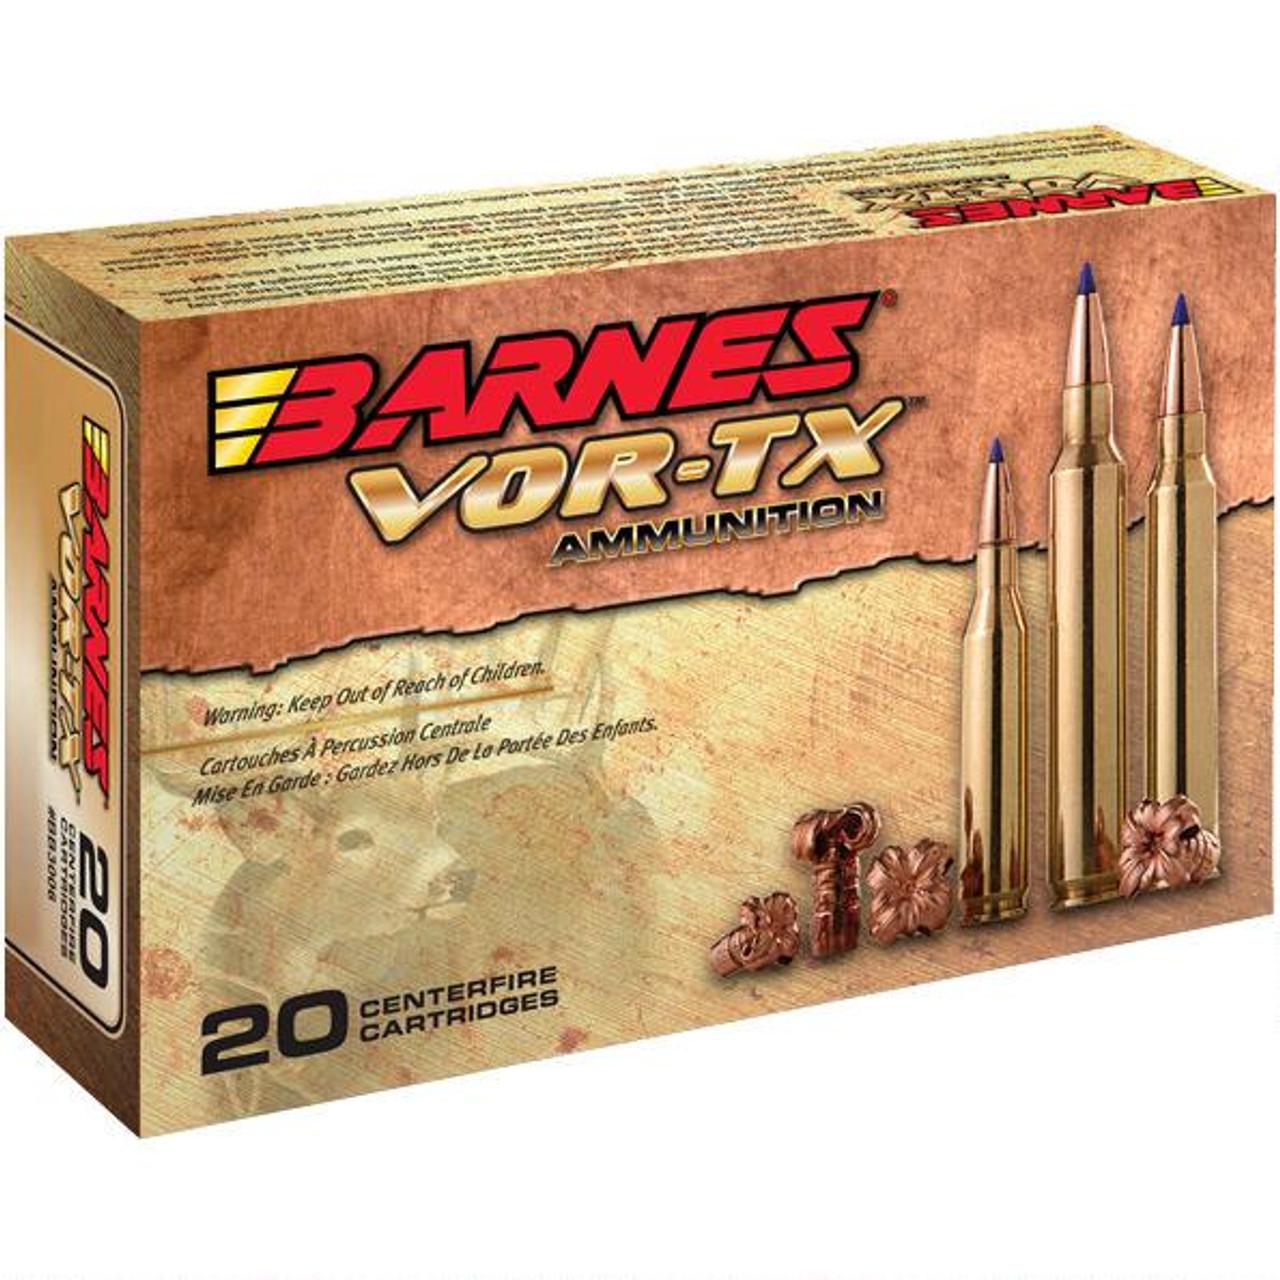 Barnes VOR-TX 6.5 Creedmoor  120 Gr, Lead Free TTSX-BT, 20 Rds